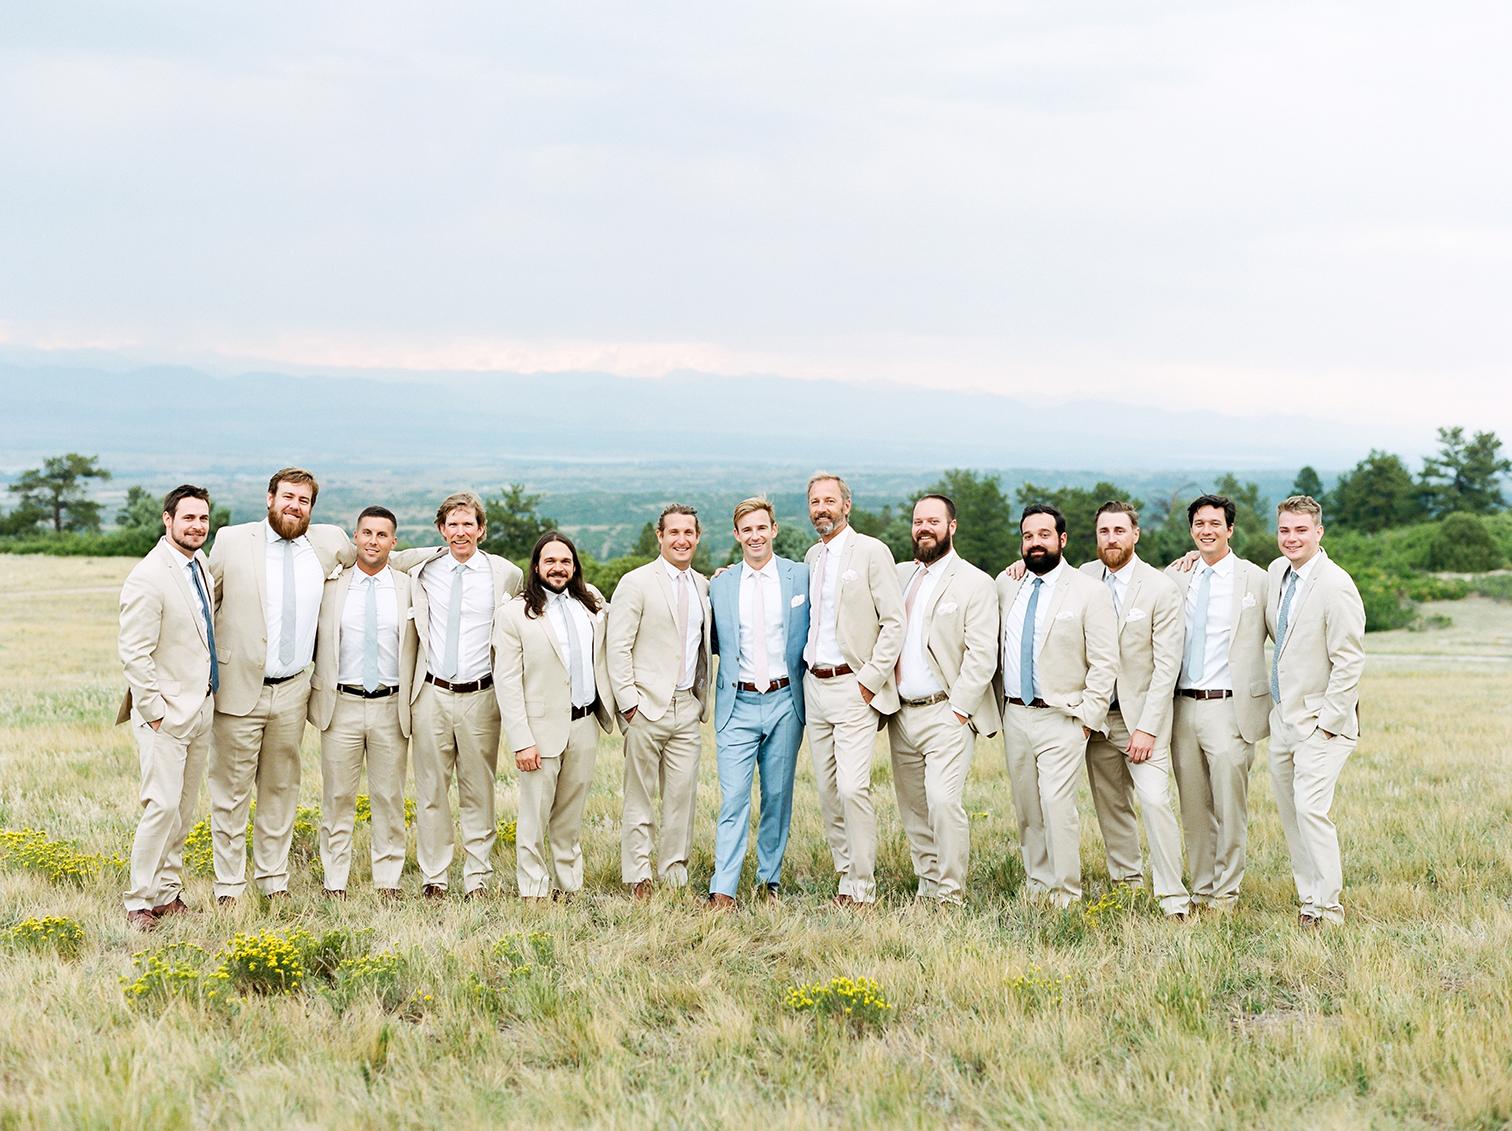 Wedding Photographers Colorado, Mountain Top Weddings, Groomsmen in Suits